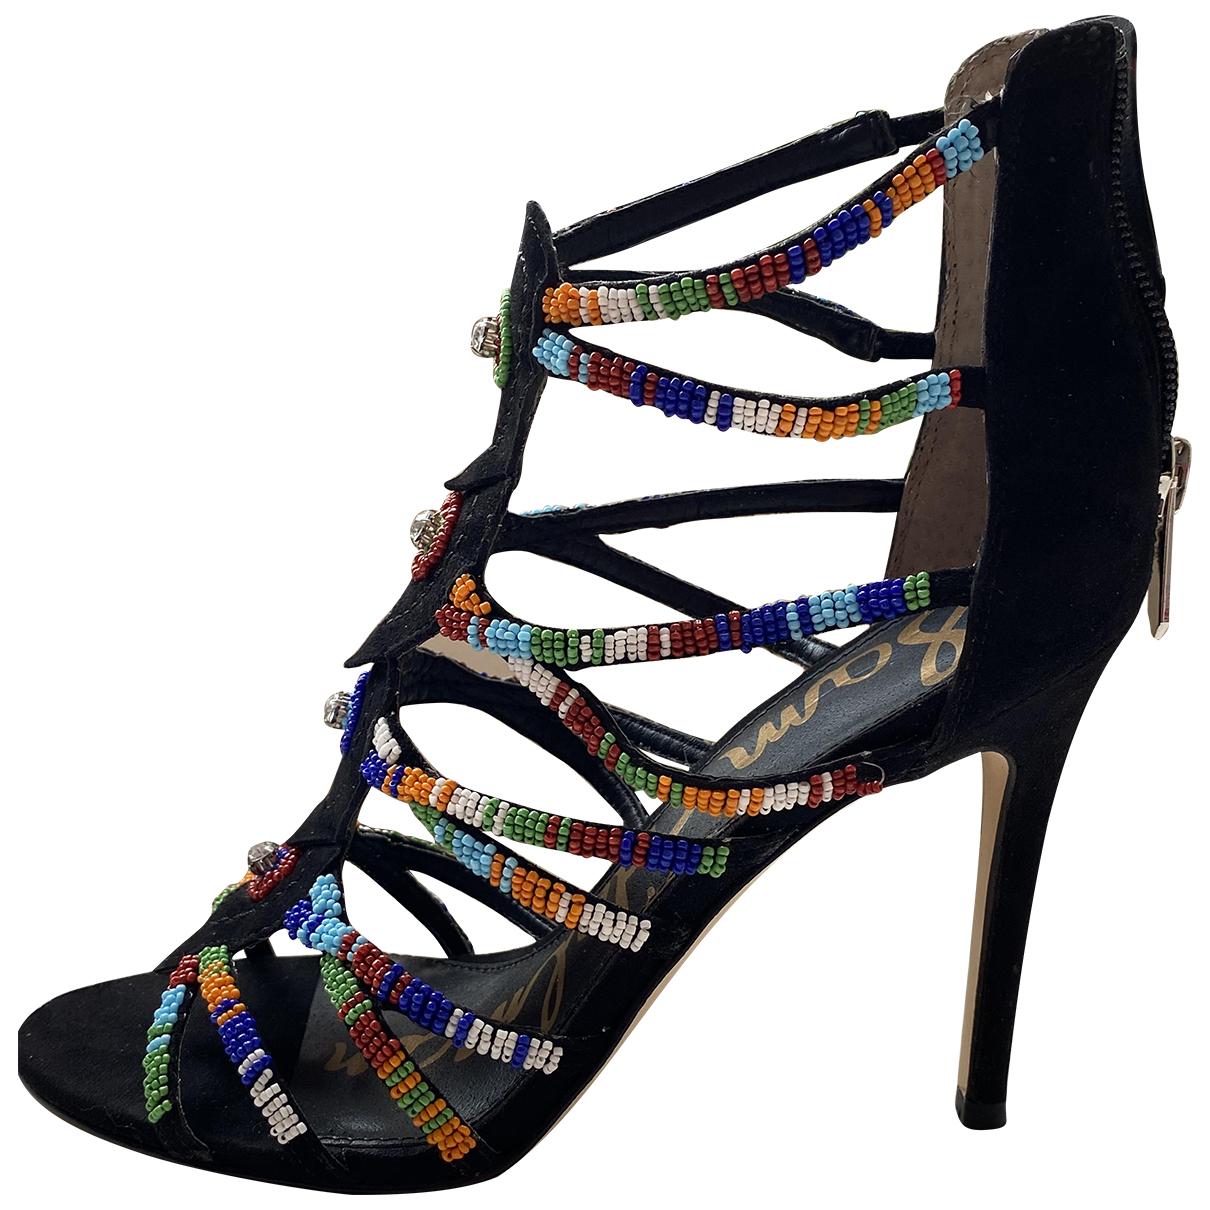 Sam Edelman N Multicolour Leather Heels for Women 36 EU